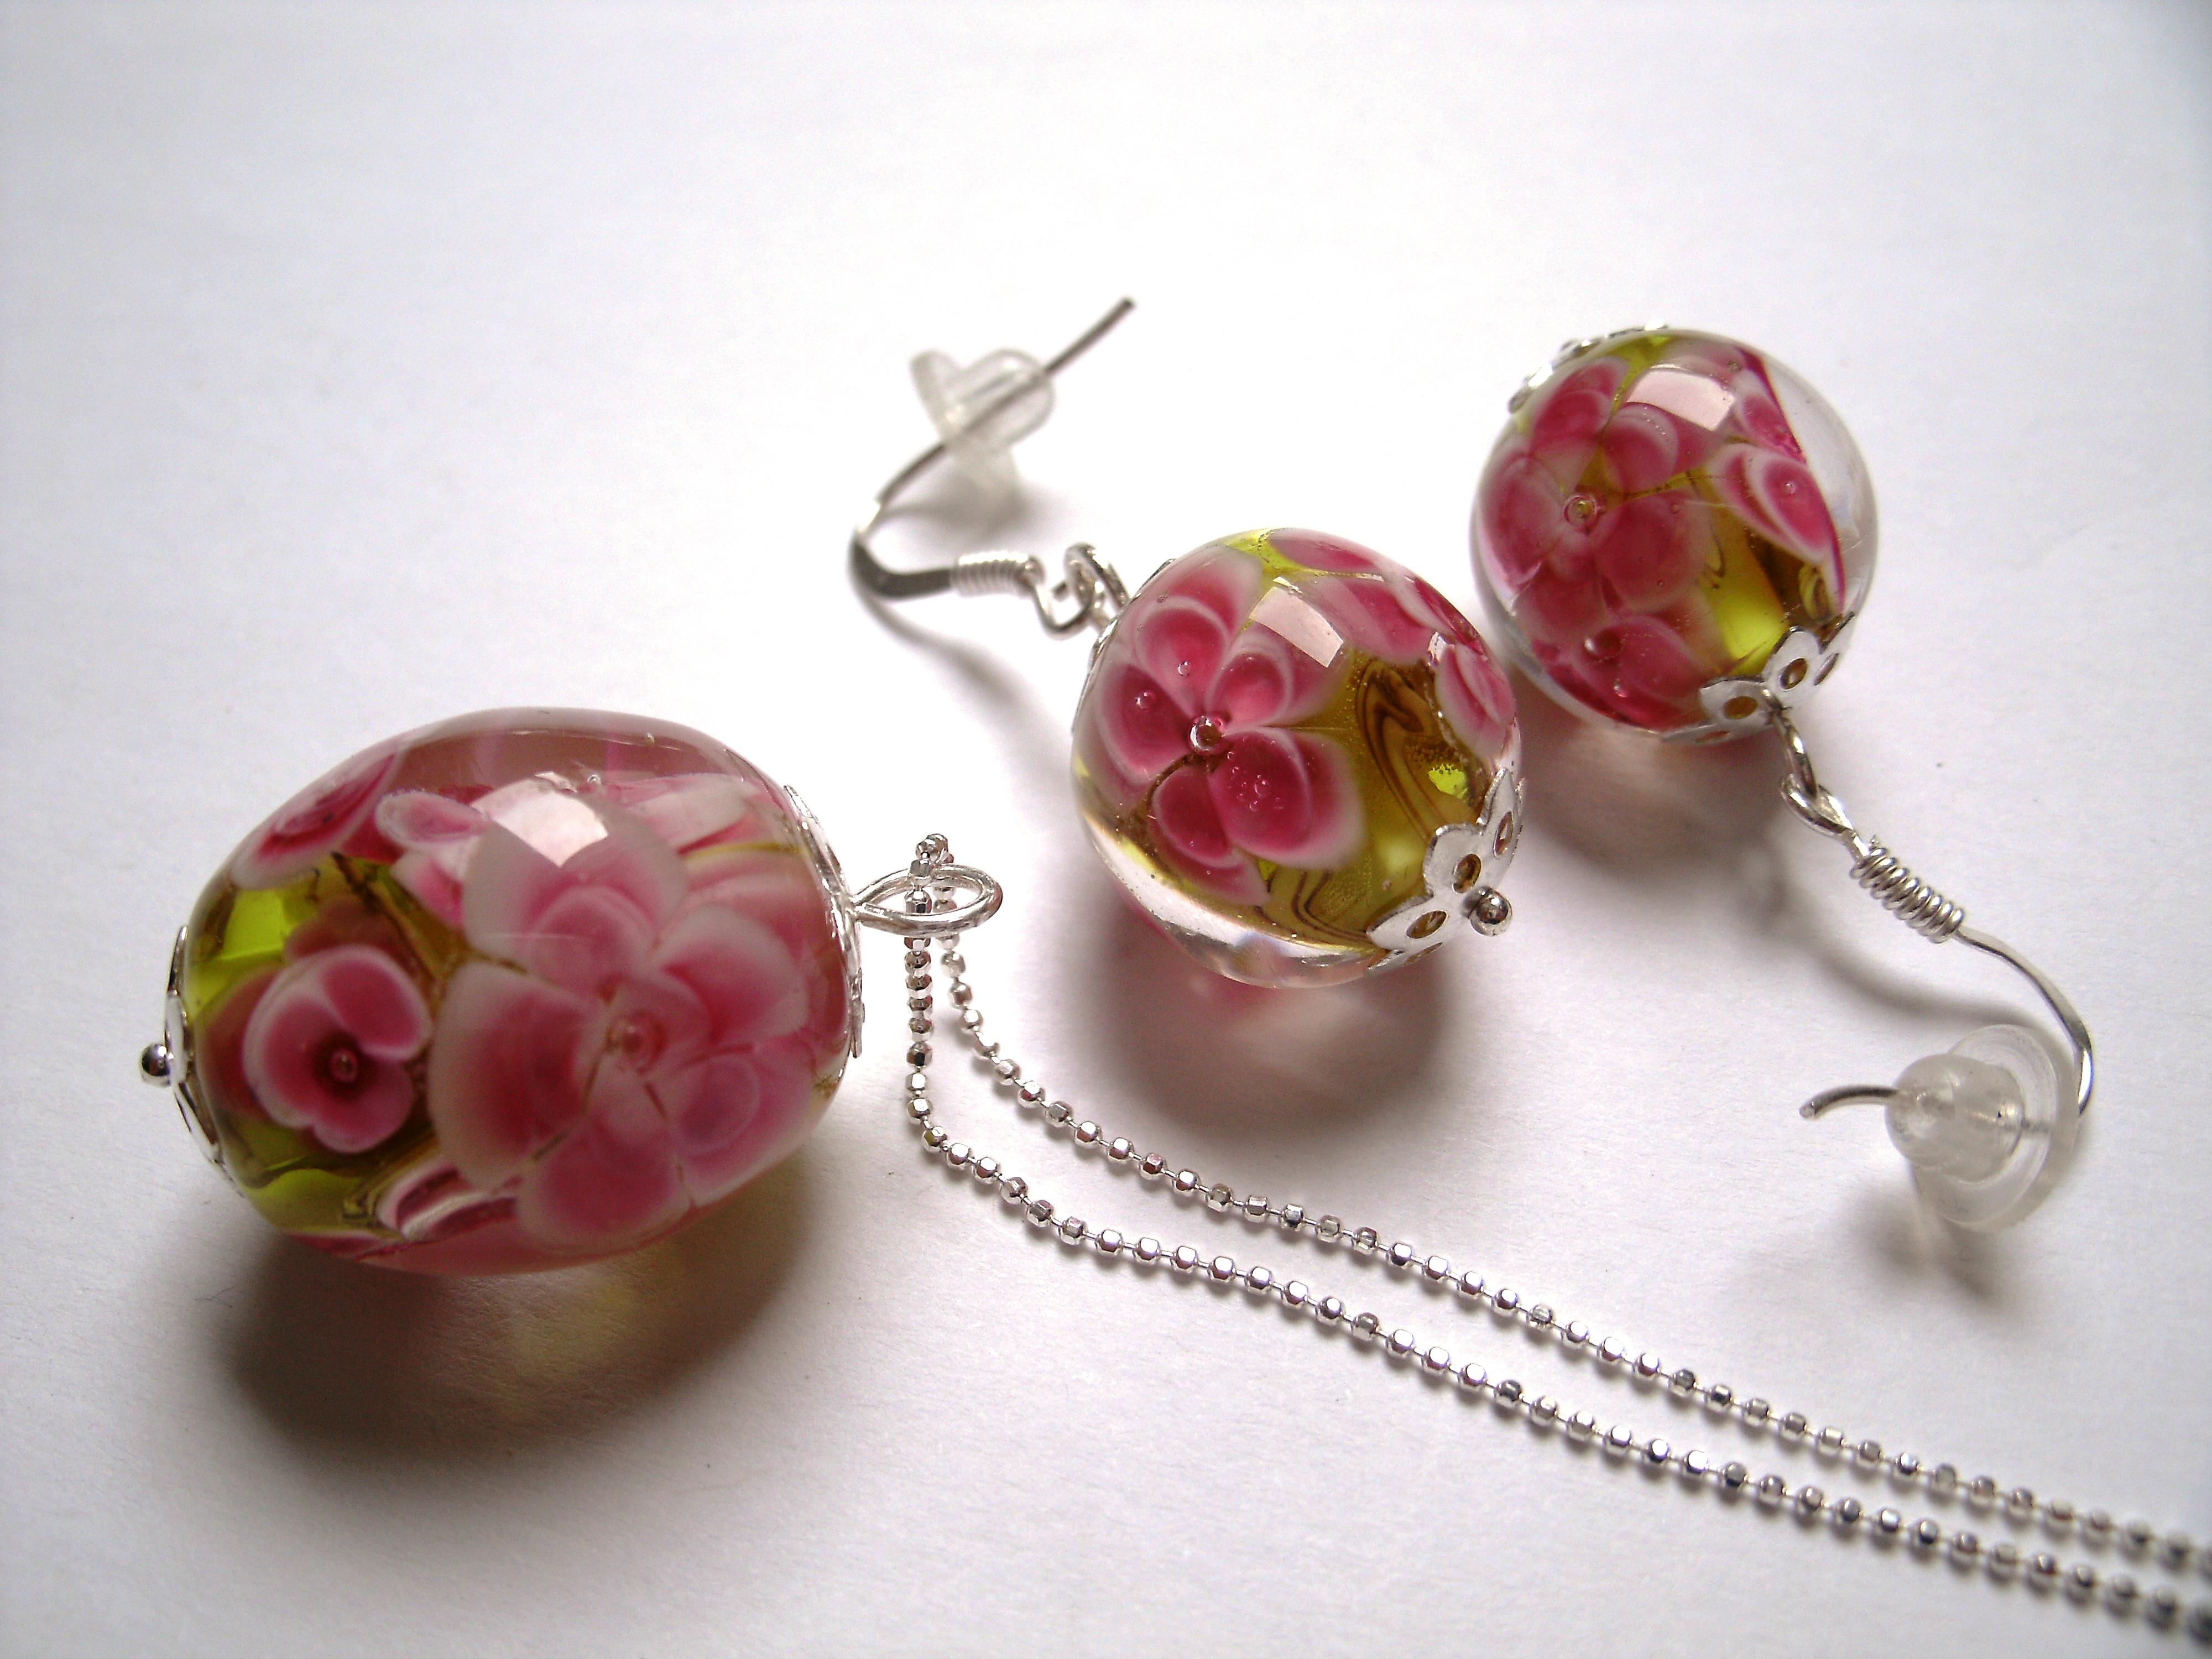 Bijoux Claramints, atelier de filage de verre